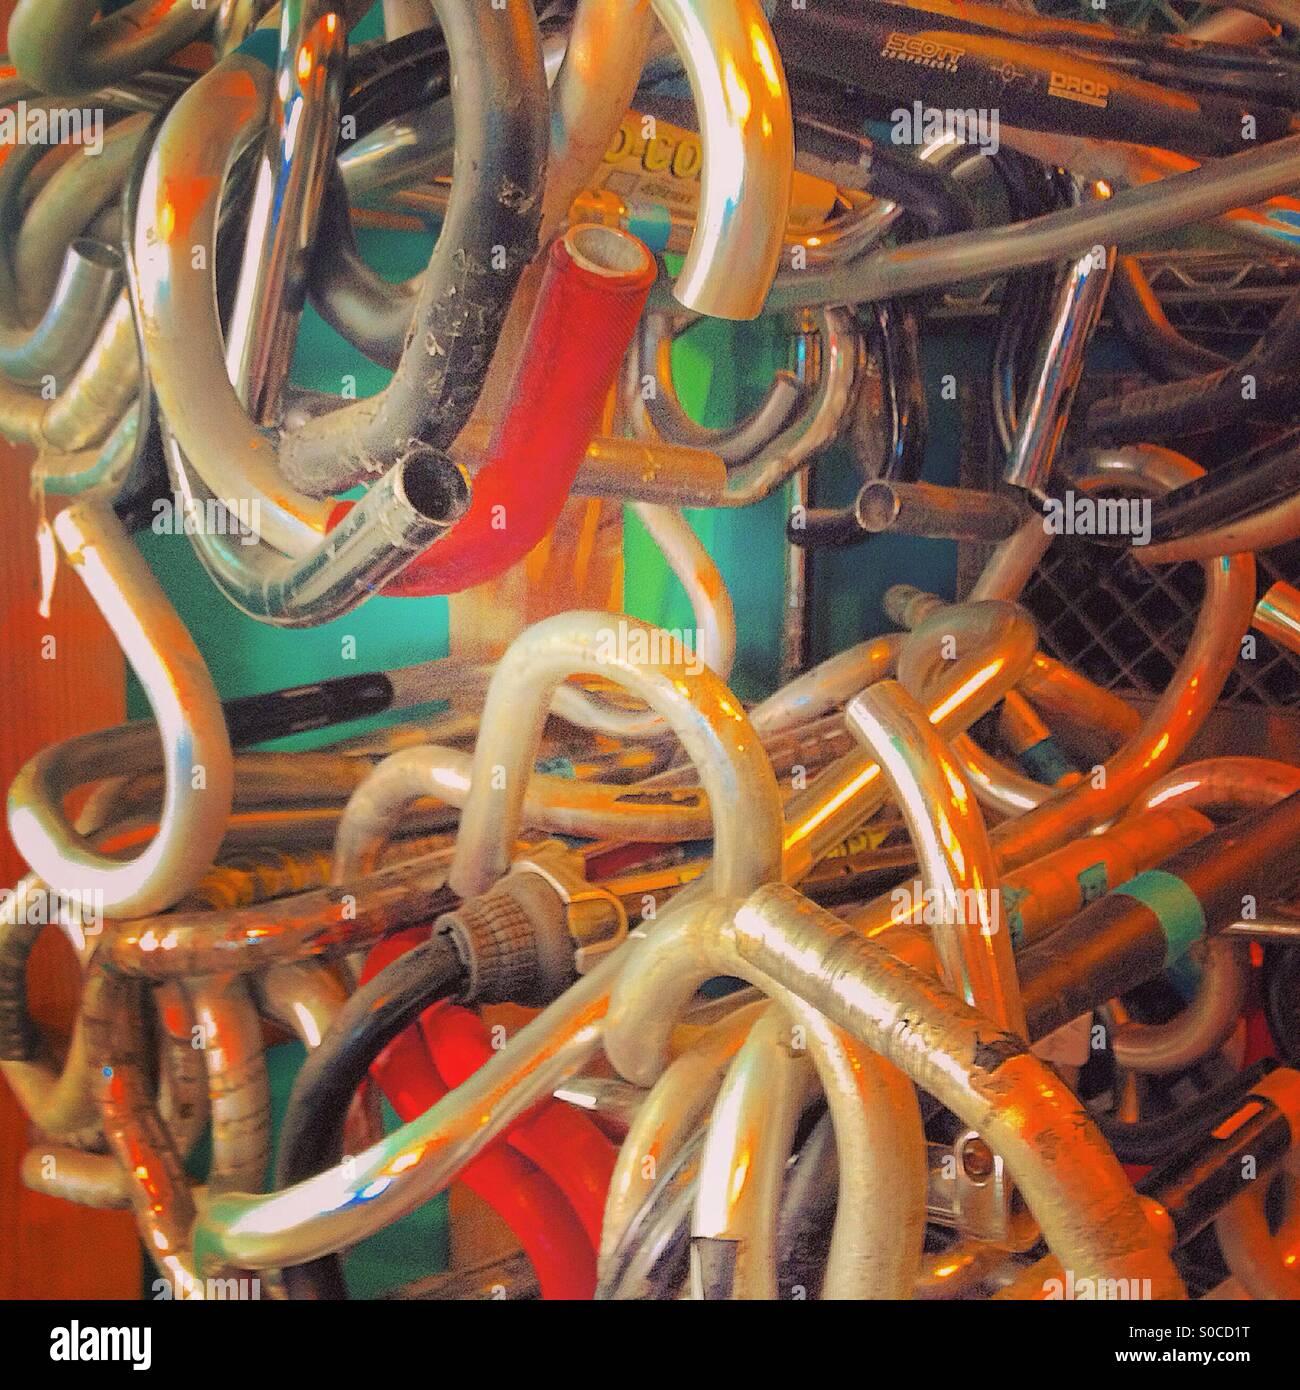 Bicycle handlebars hanging - Stock Image